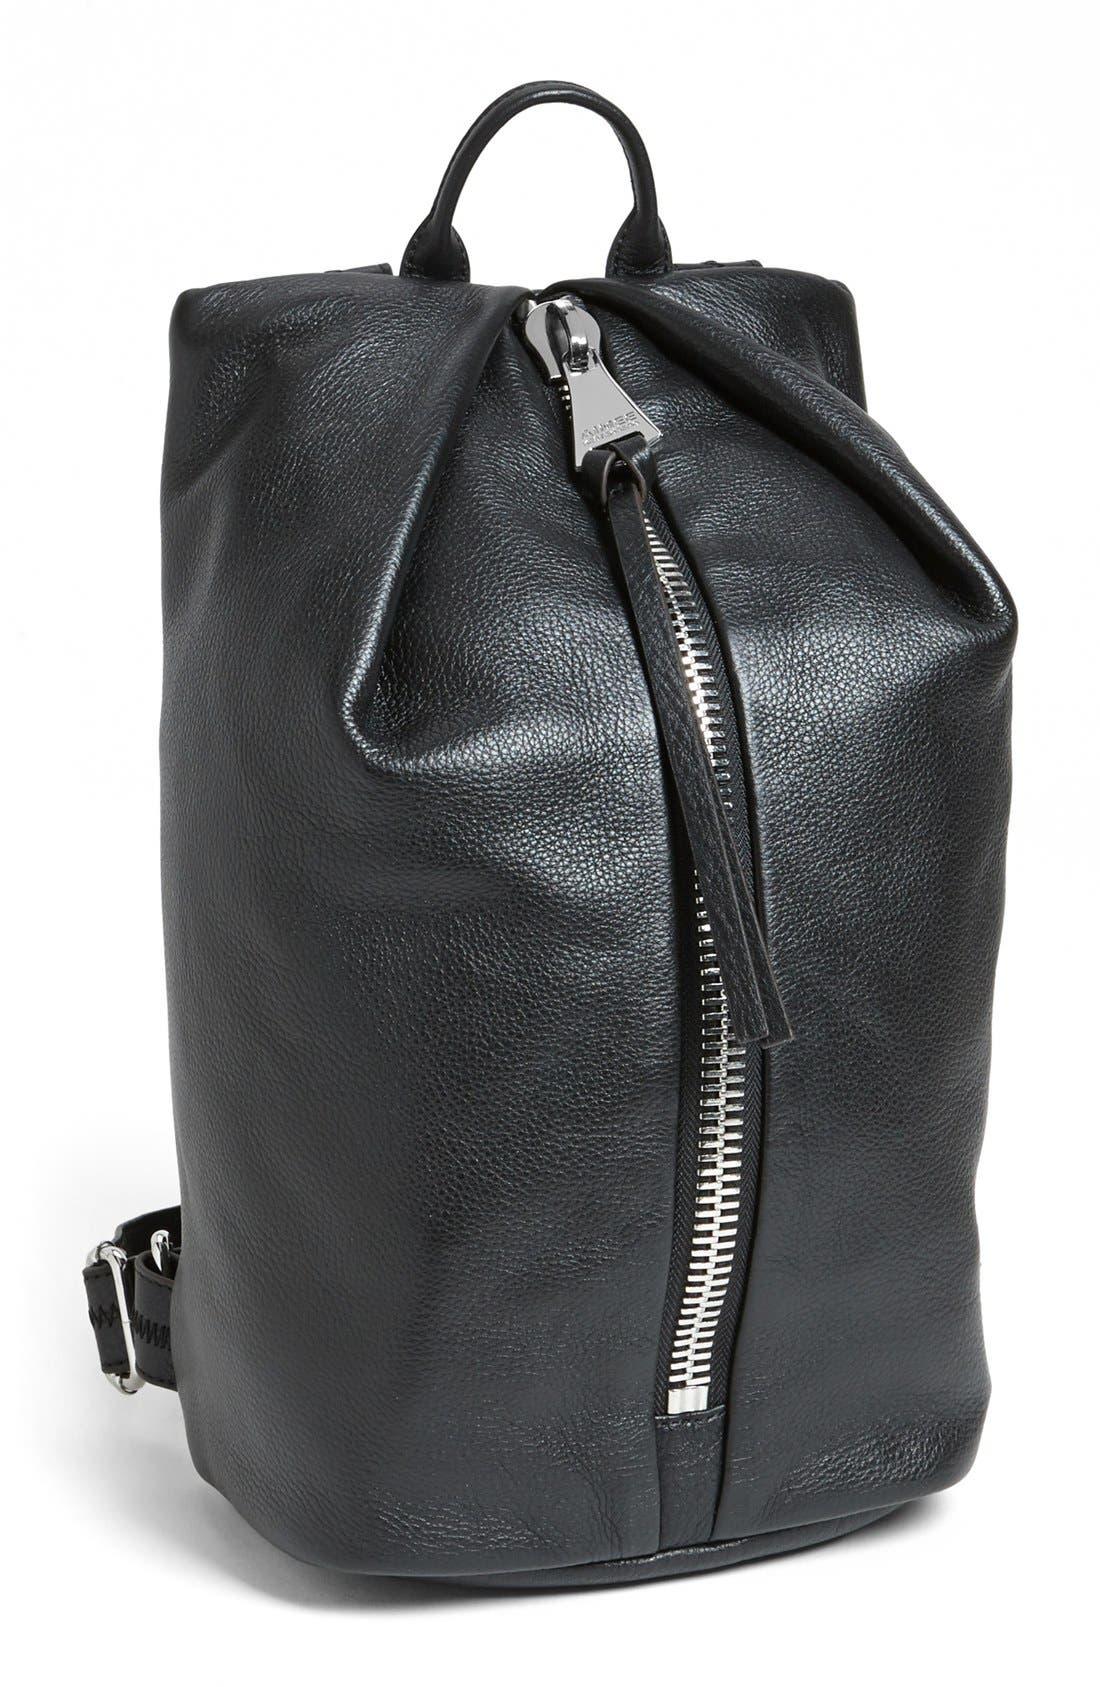 Alternate Image 1 Selected - Aimee Kestenberg 'Tamitha' Backpack